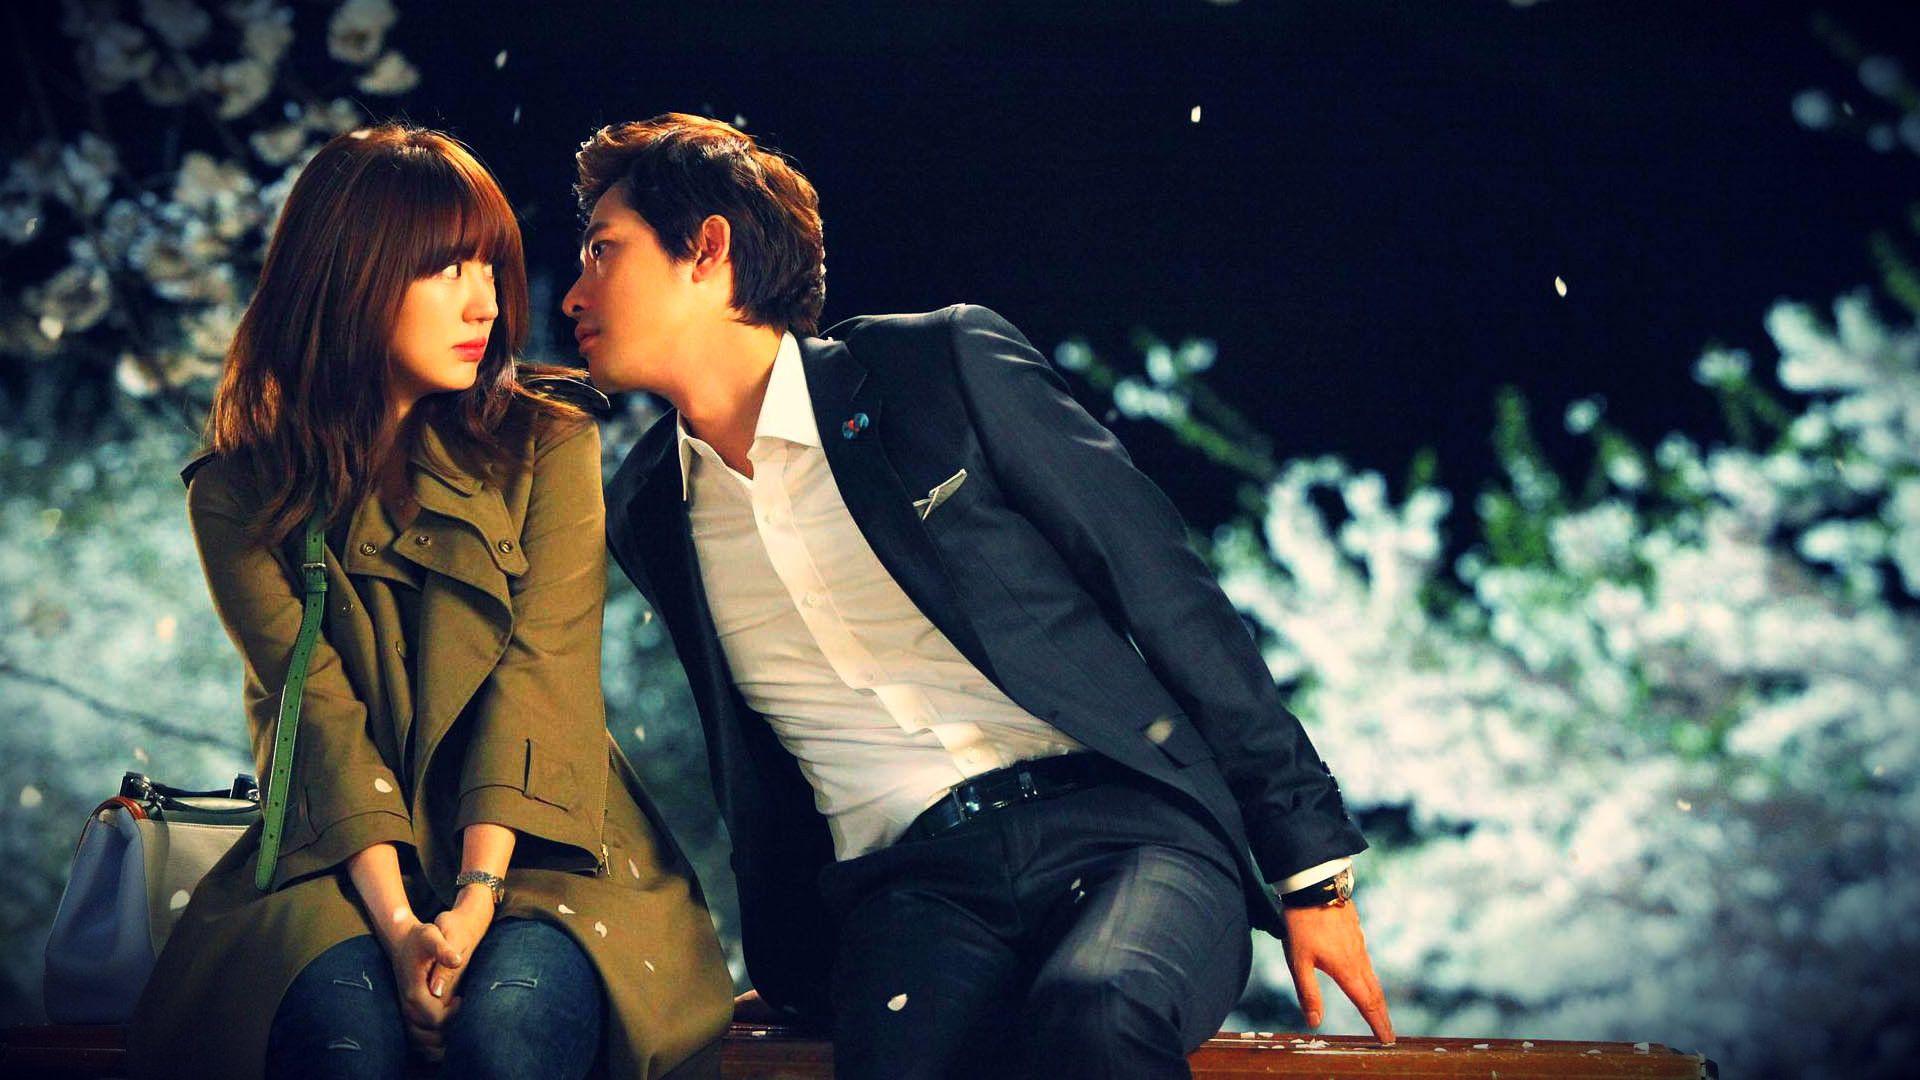 Korean Dramas Wallpaper Lie To Me Lovely Love Lie Lie To Me Korean Drama Movies